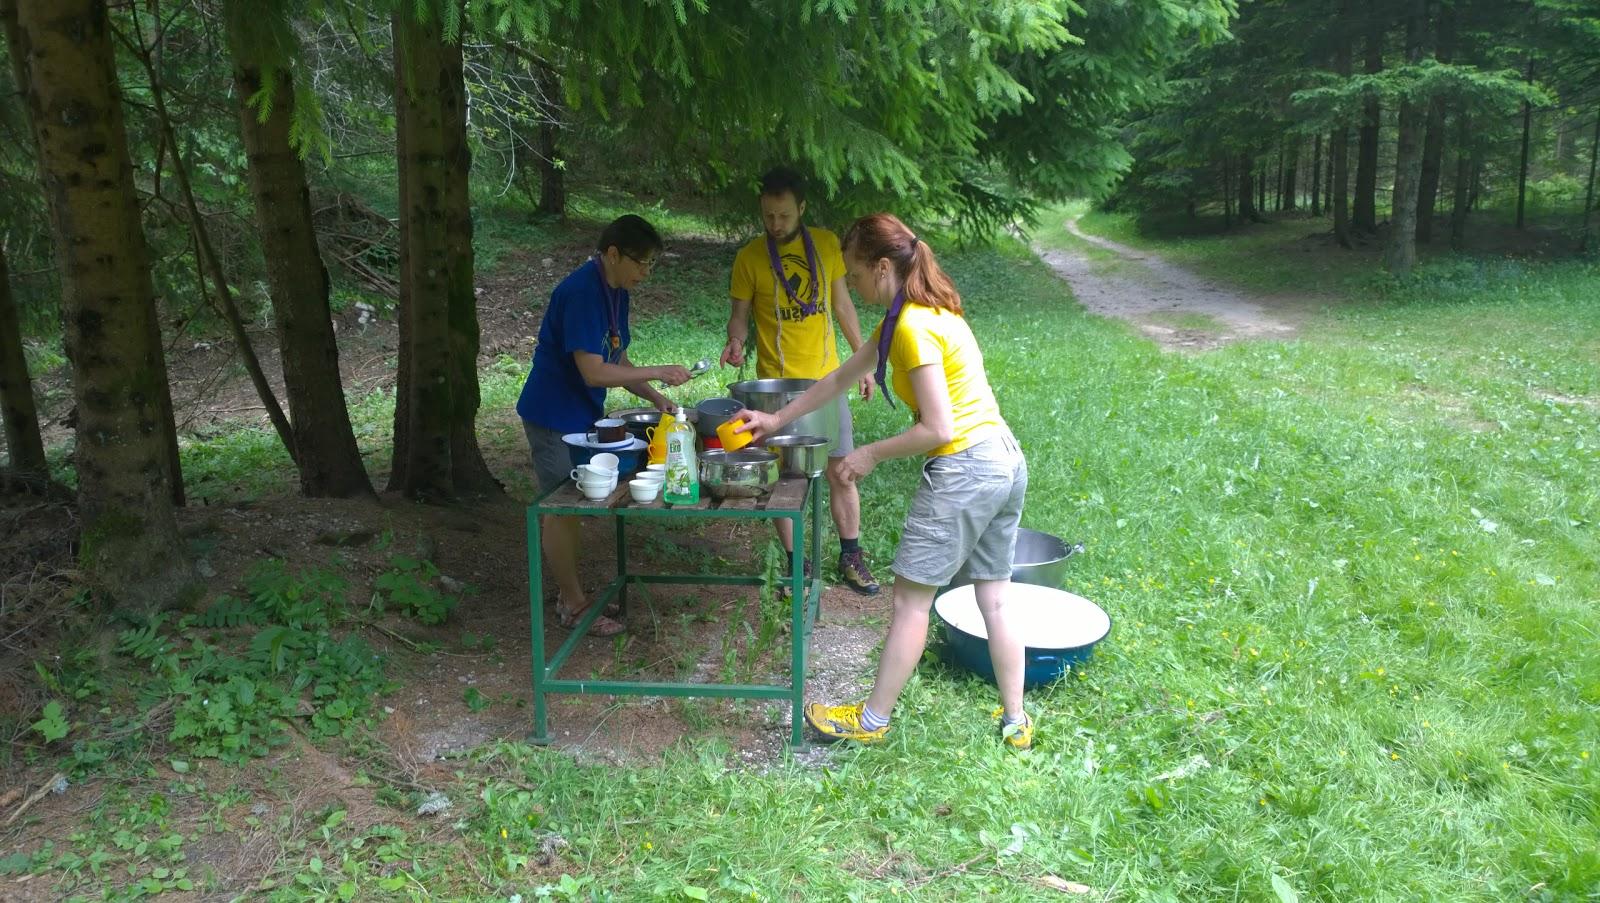 Piknik s starši, Črni dol 2016 - WP_20160625_13_41_39_Pro.jpg